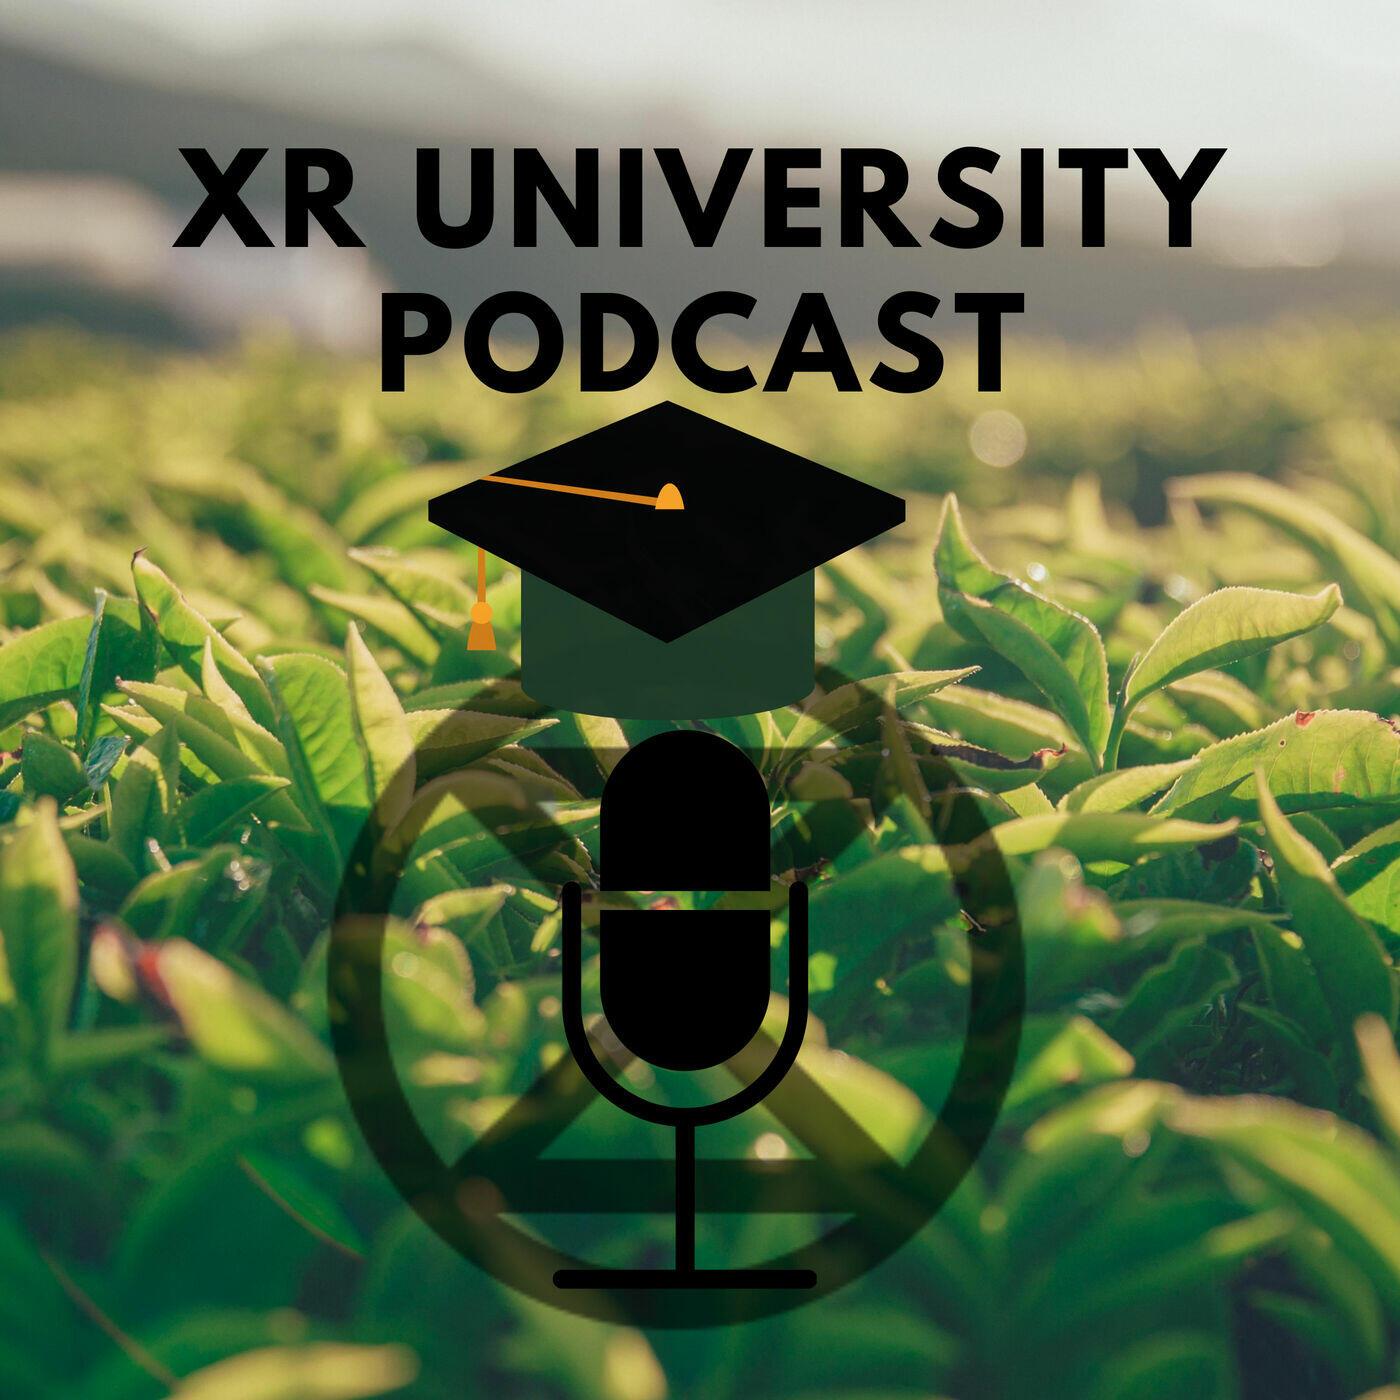 XR University